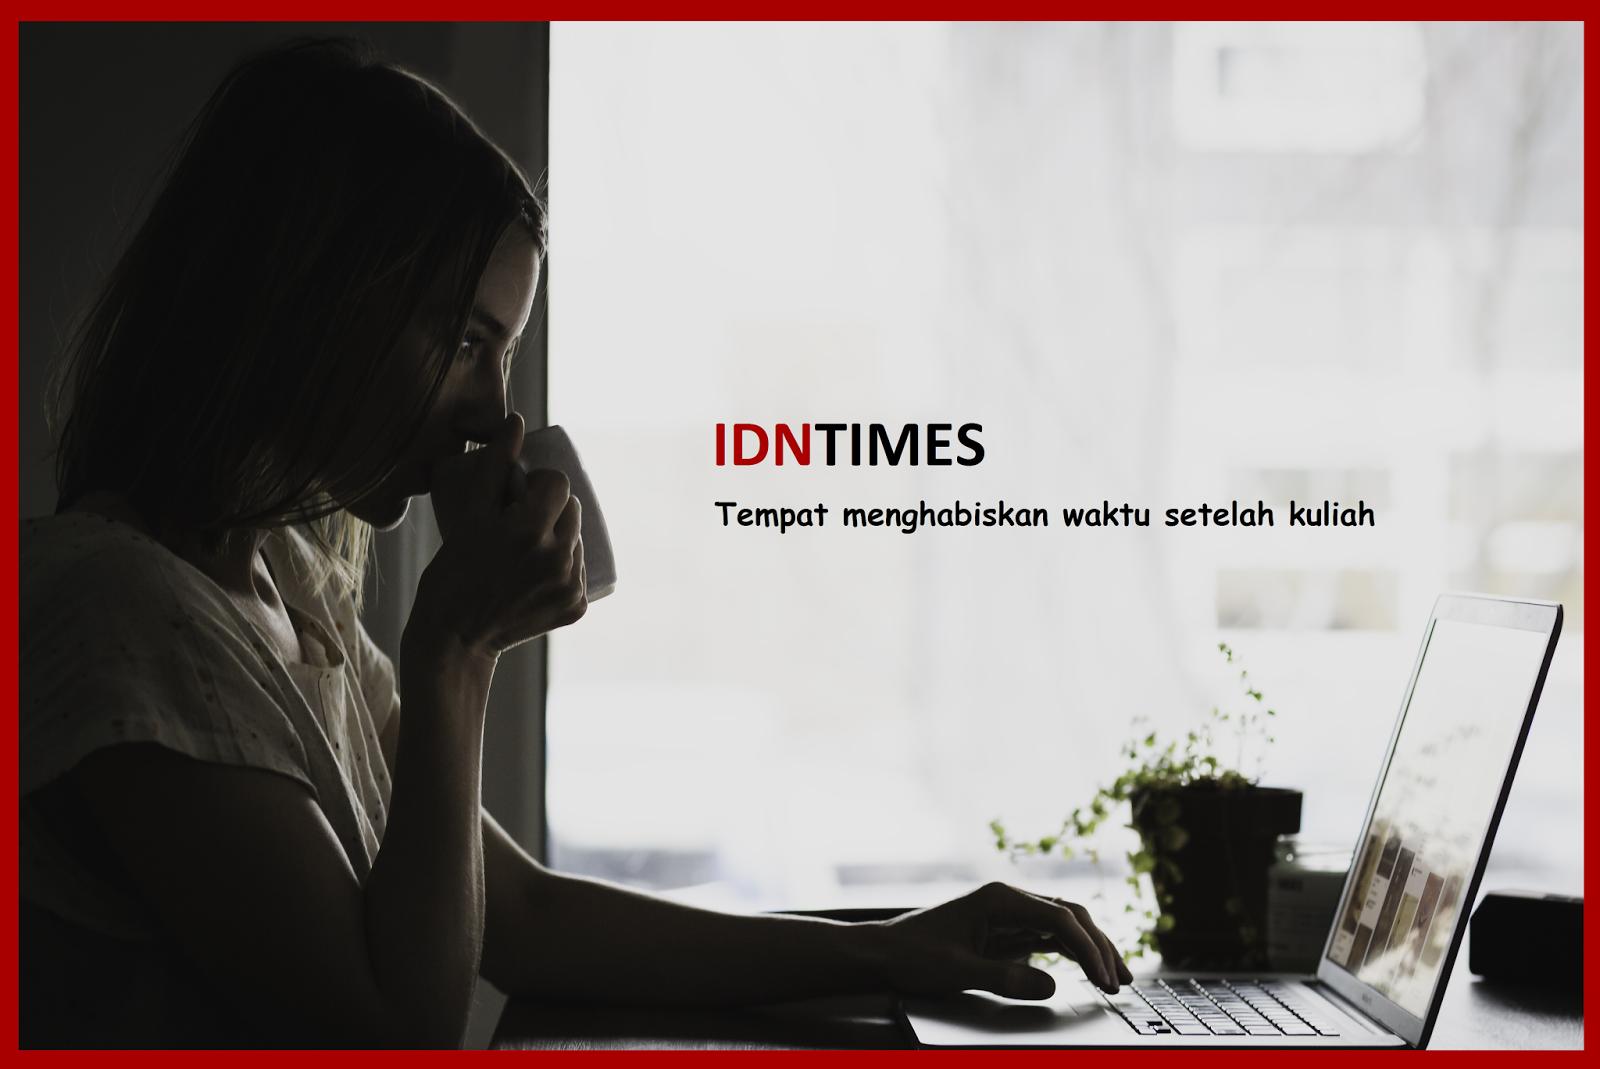 IDN Times, Tempat Menghabiskan Waktu Luang Setelah Pulang Kuliah